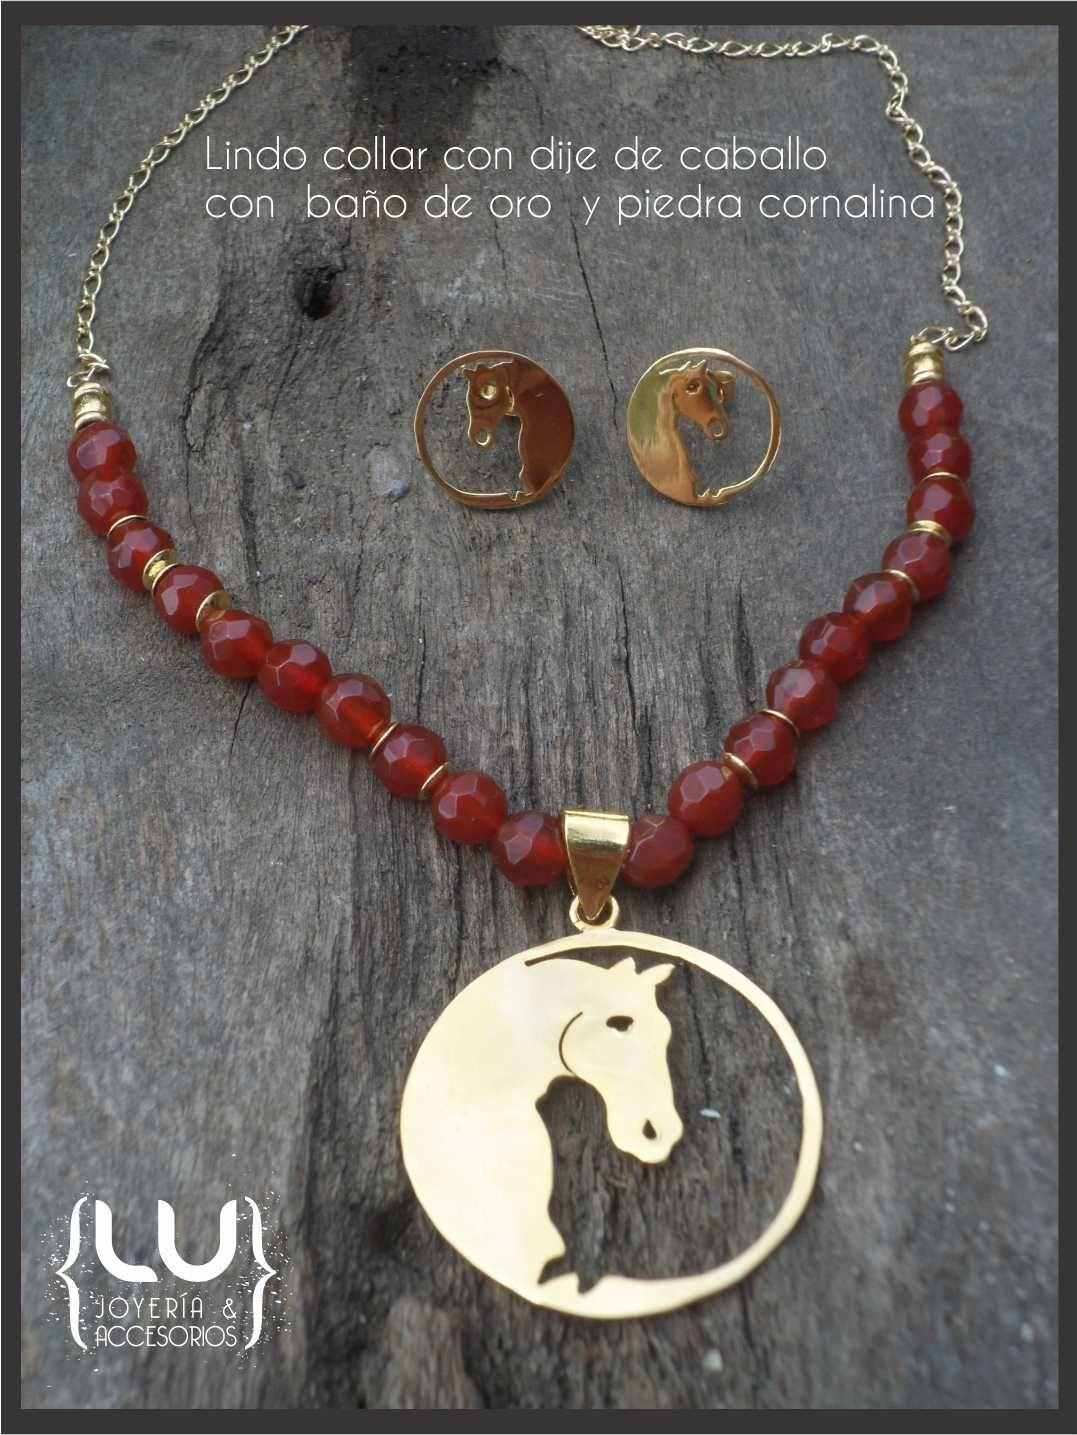 ebdce456f912 Caballo yin yang LU Joyería   Accesorios  accesorios  aretes  collares   pulseras  joyería  accesorios  moda  fashion  Colombia  medellin